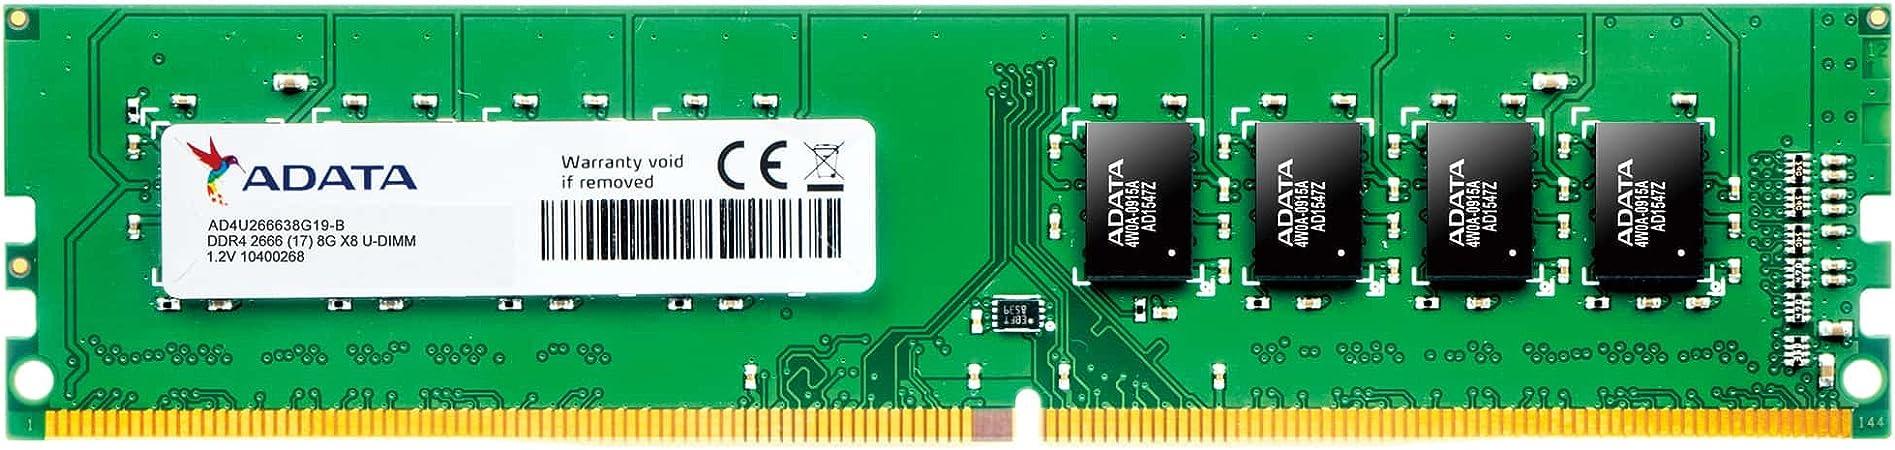 ADATA Premier 8GB DDR4 2666MHz Memory Module - Memory Modules (8 GB, 1 x 8  GB, DDR4, 2666 MHz, 288-pin DIMM) at Amazon.com